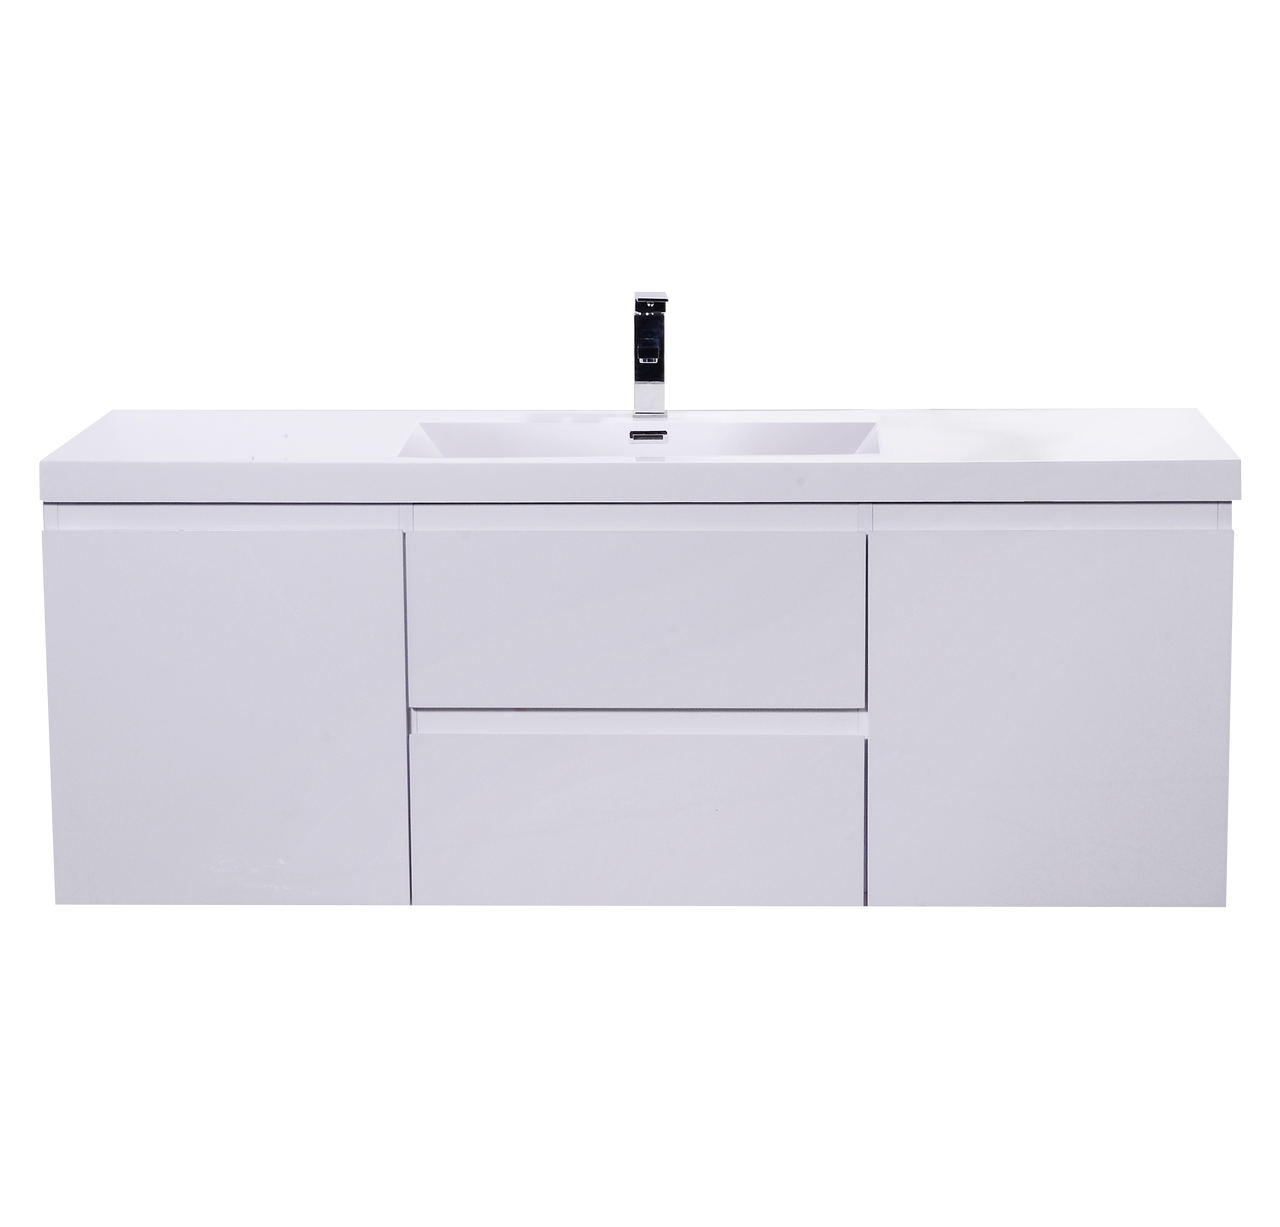 Moreno Mob 60 Single Sink High Gloss White Wall Mounted Modern Bathroom Vanity With Reeinforced Acrylic Sink Los Angeles Vanity